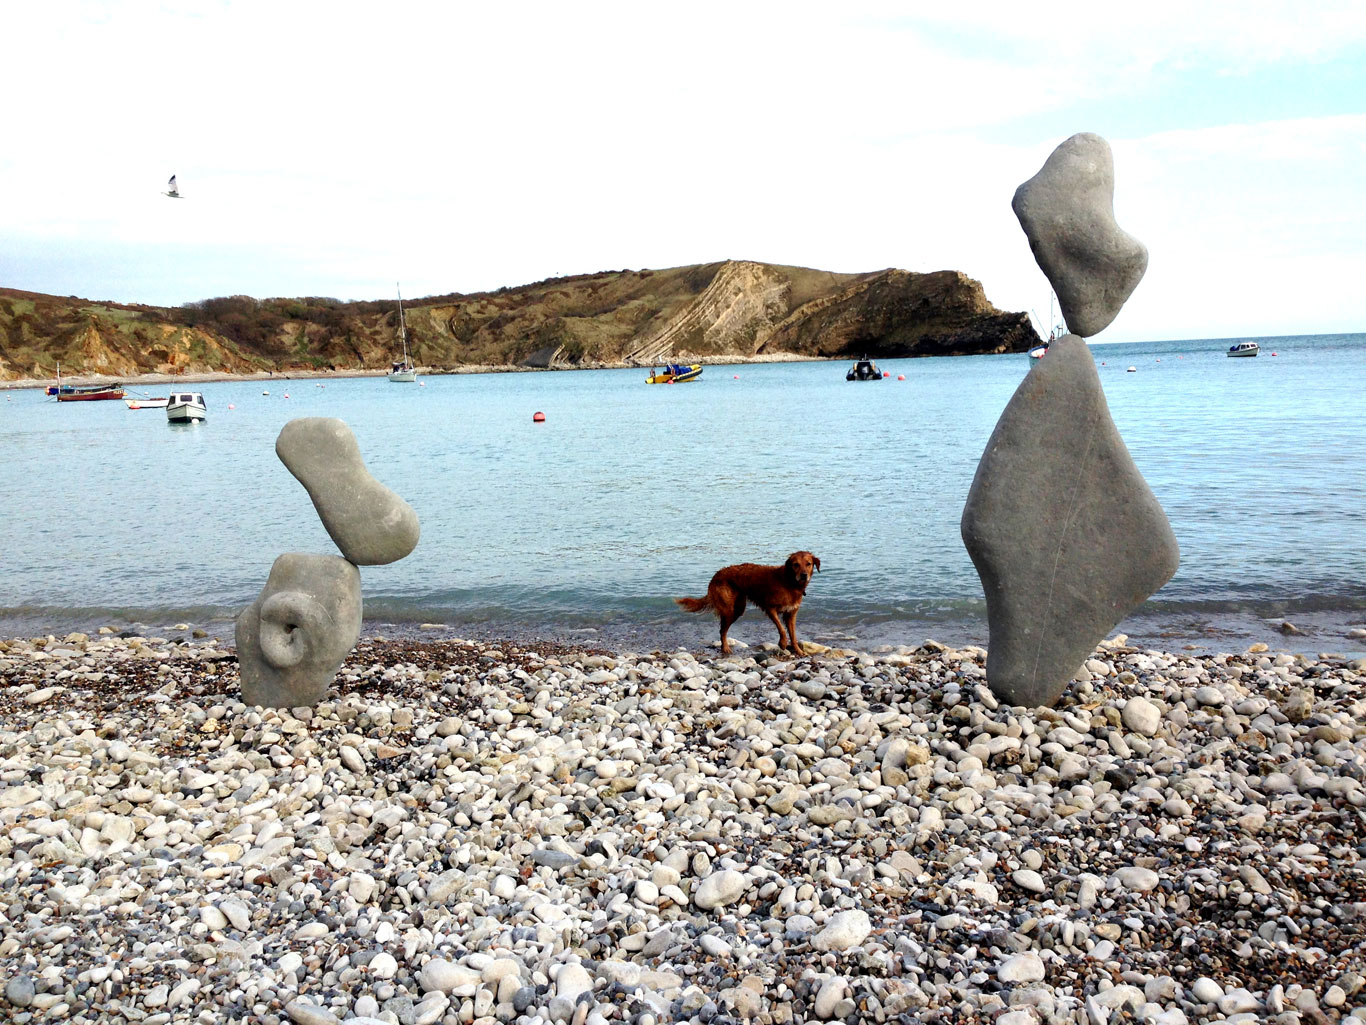 Lulworth Cove Sculptures